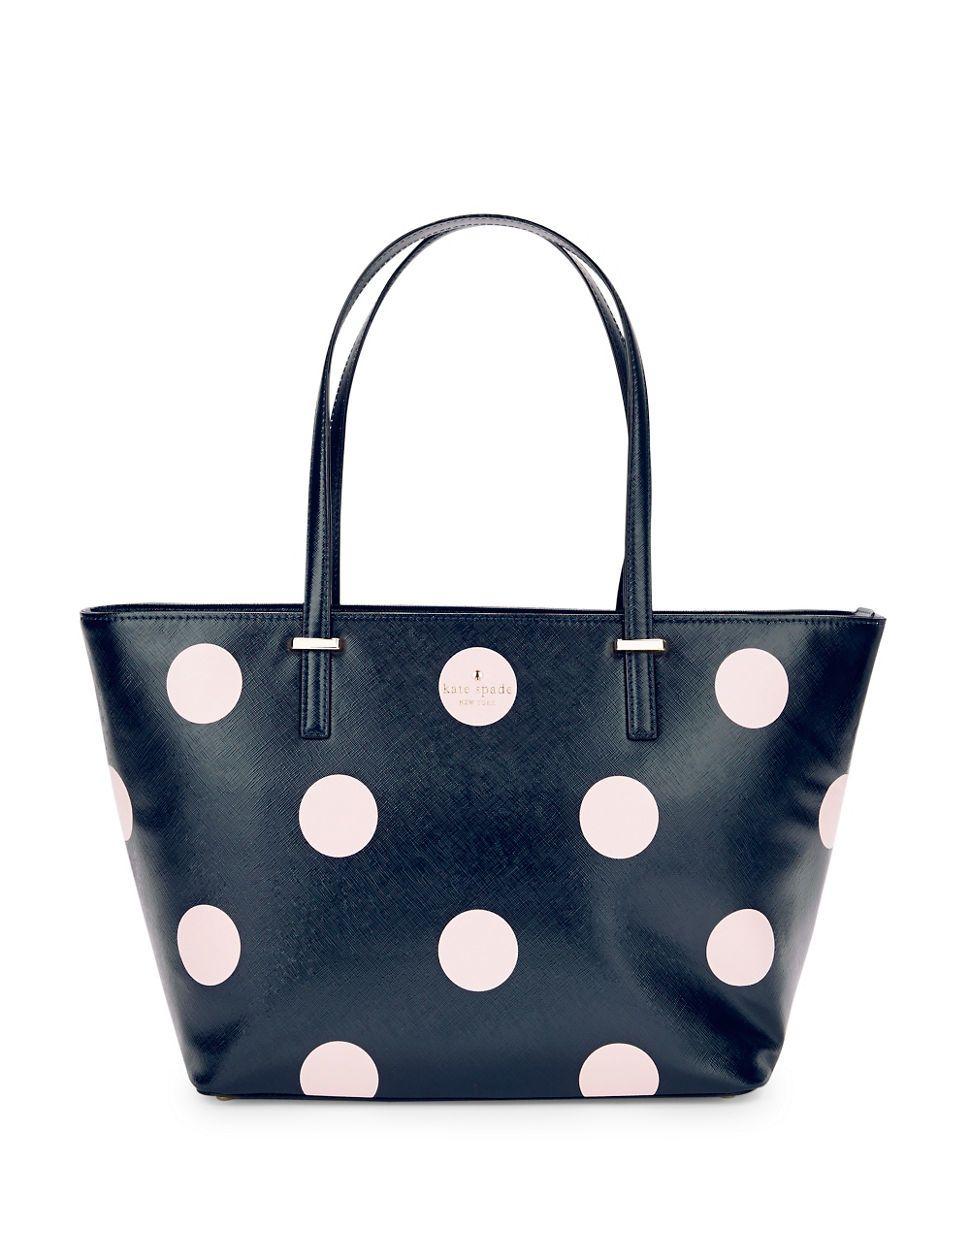 6f983ccb2d4 Women's Blue Harmony Polka Dot Tote | handbags | Kate spade tote bag ...